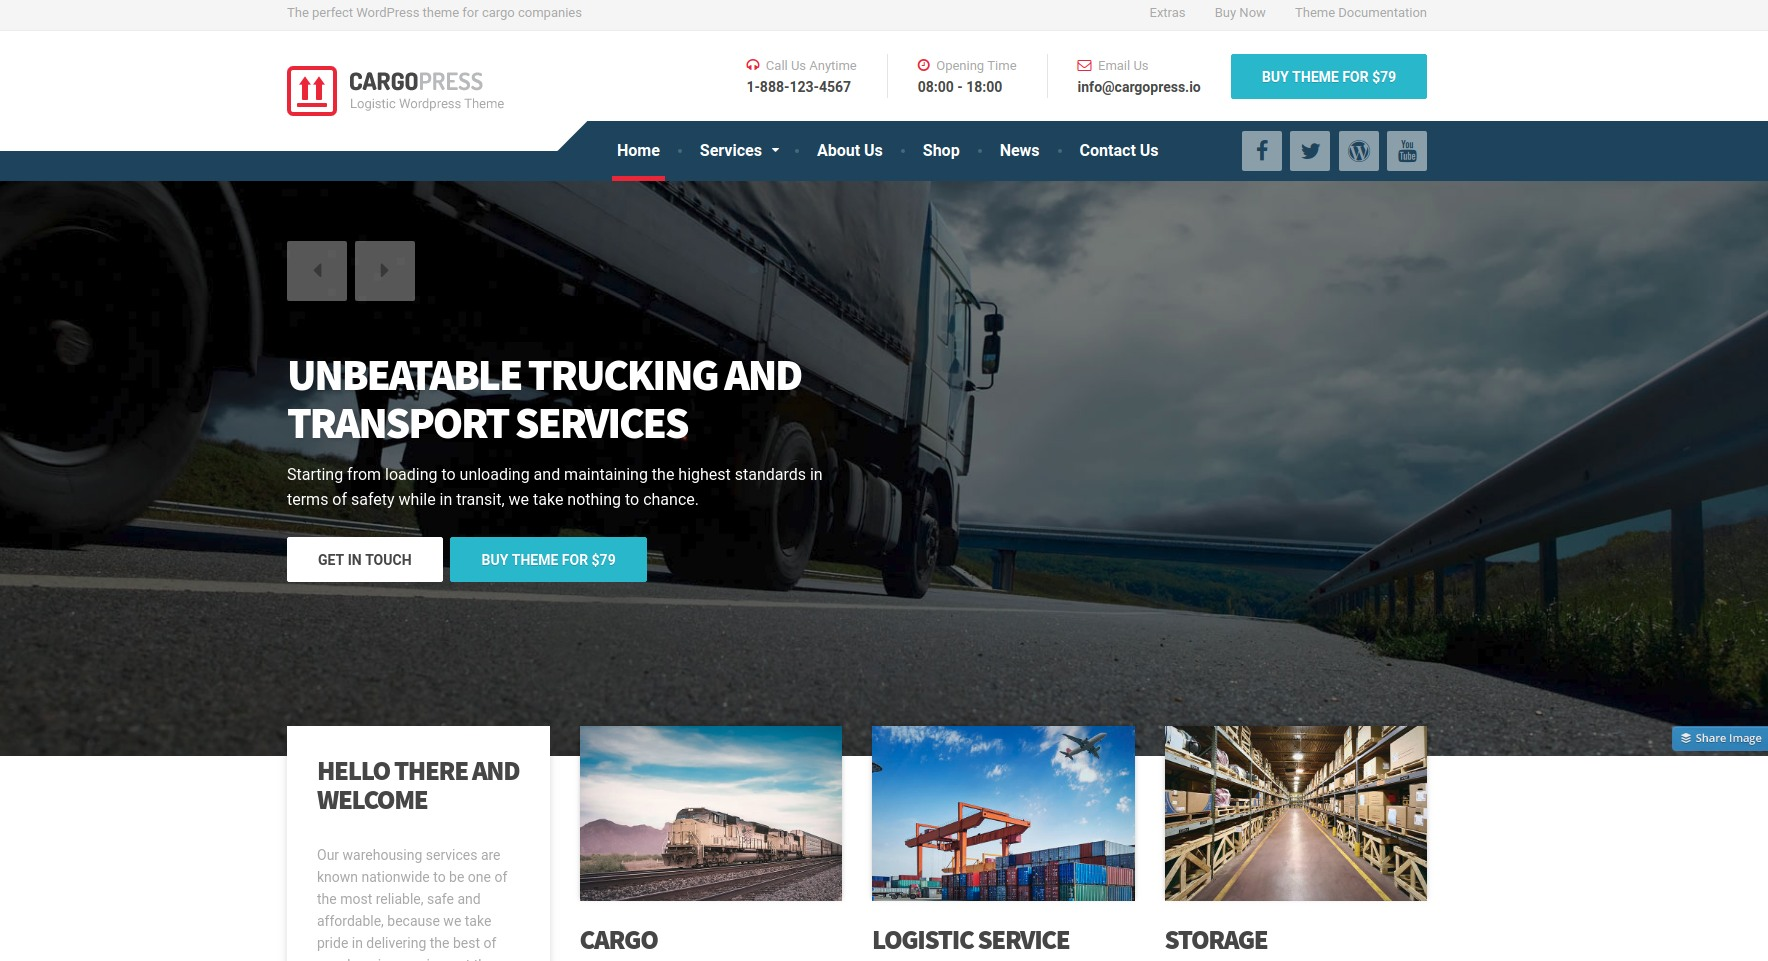 CargoPress